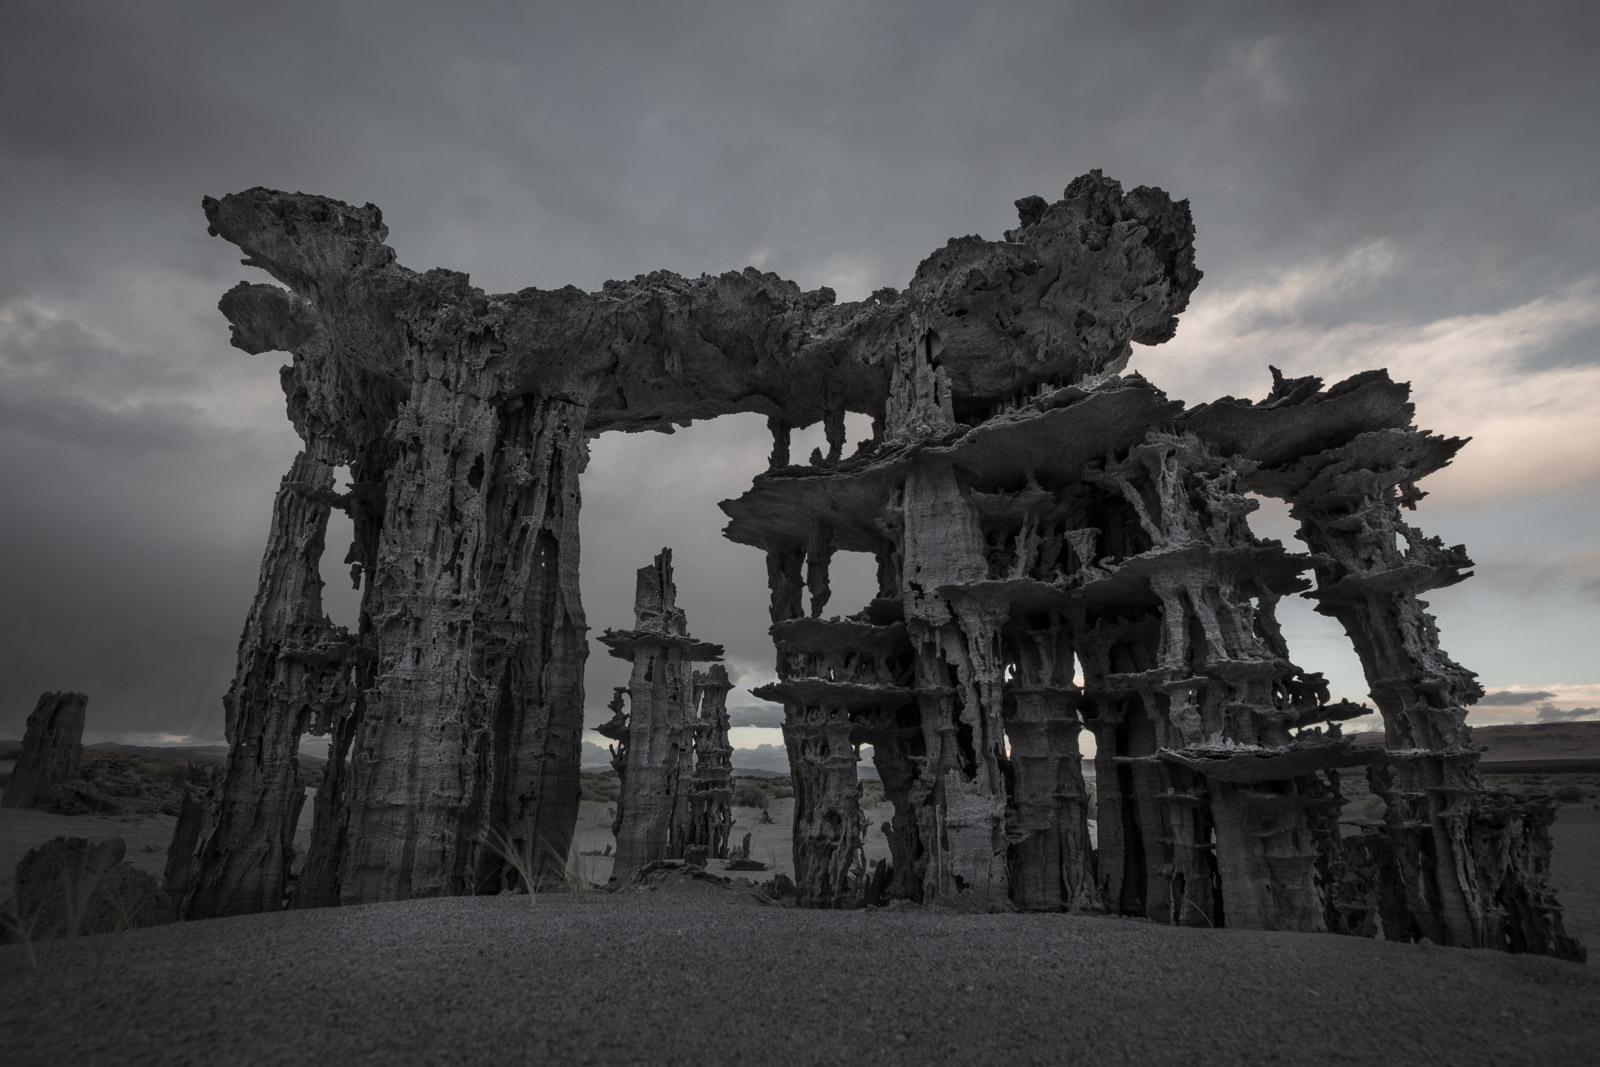 Monoliths -